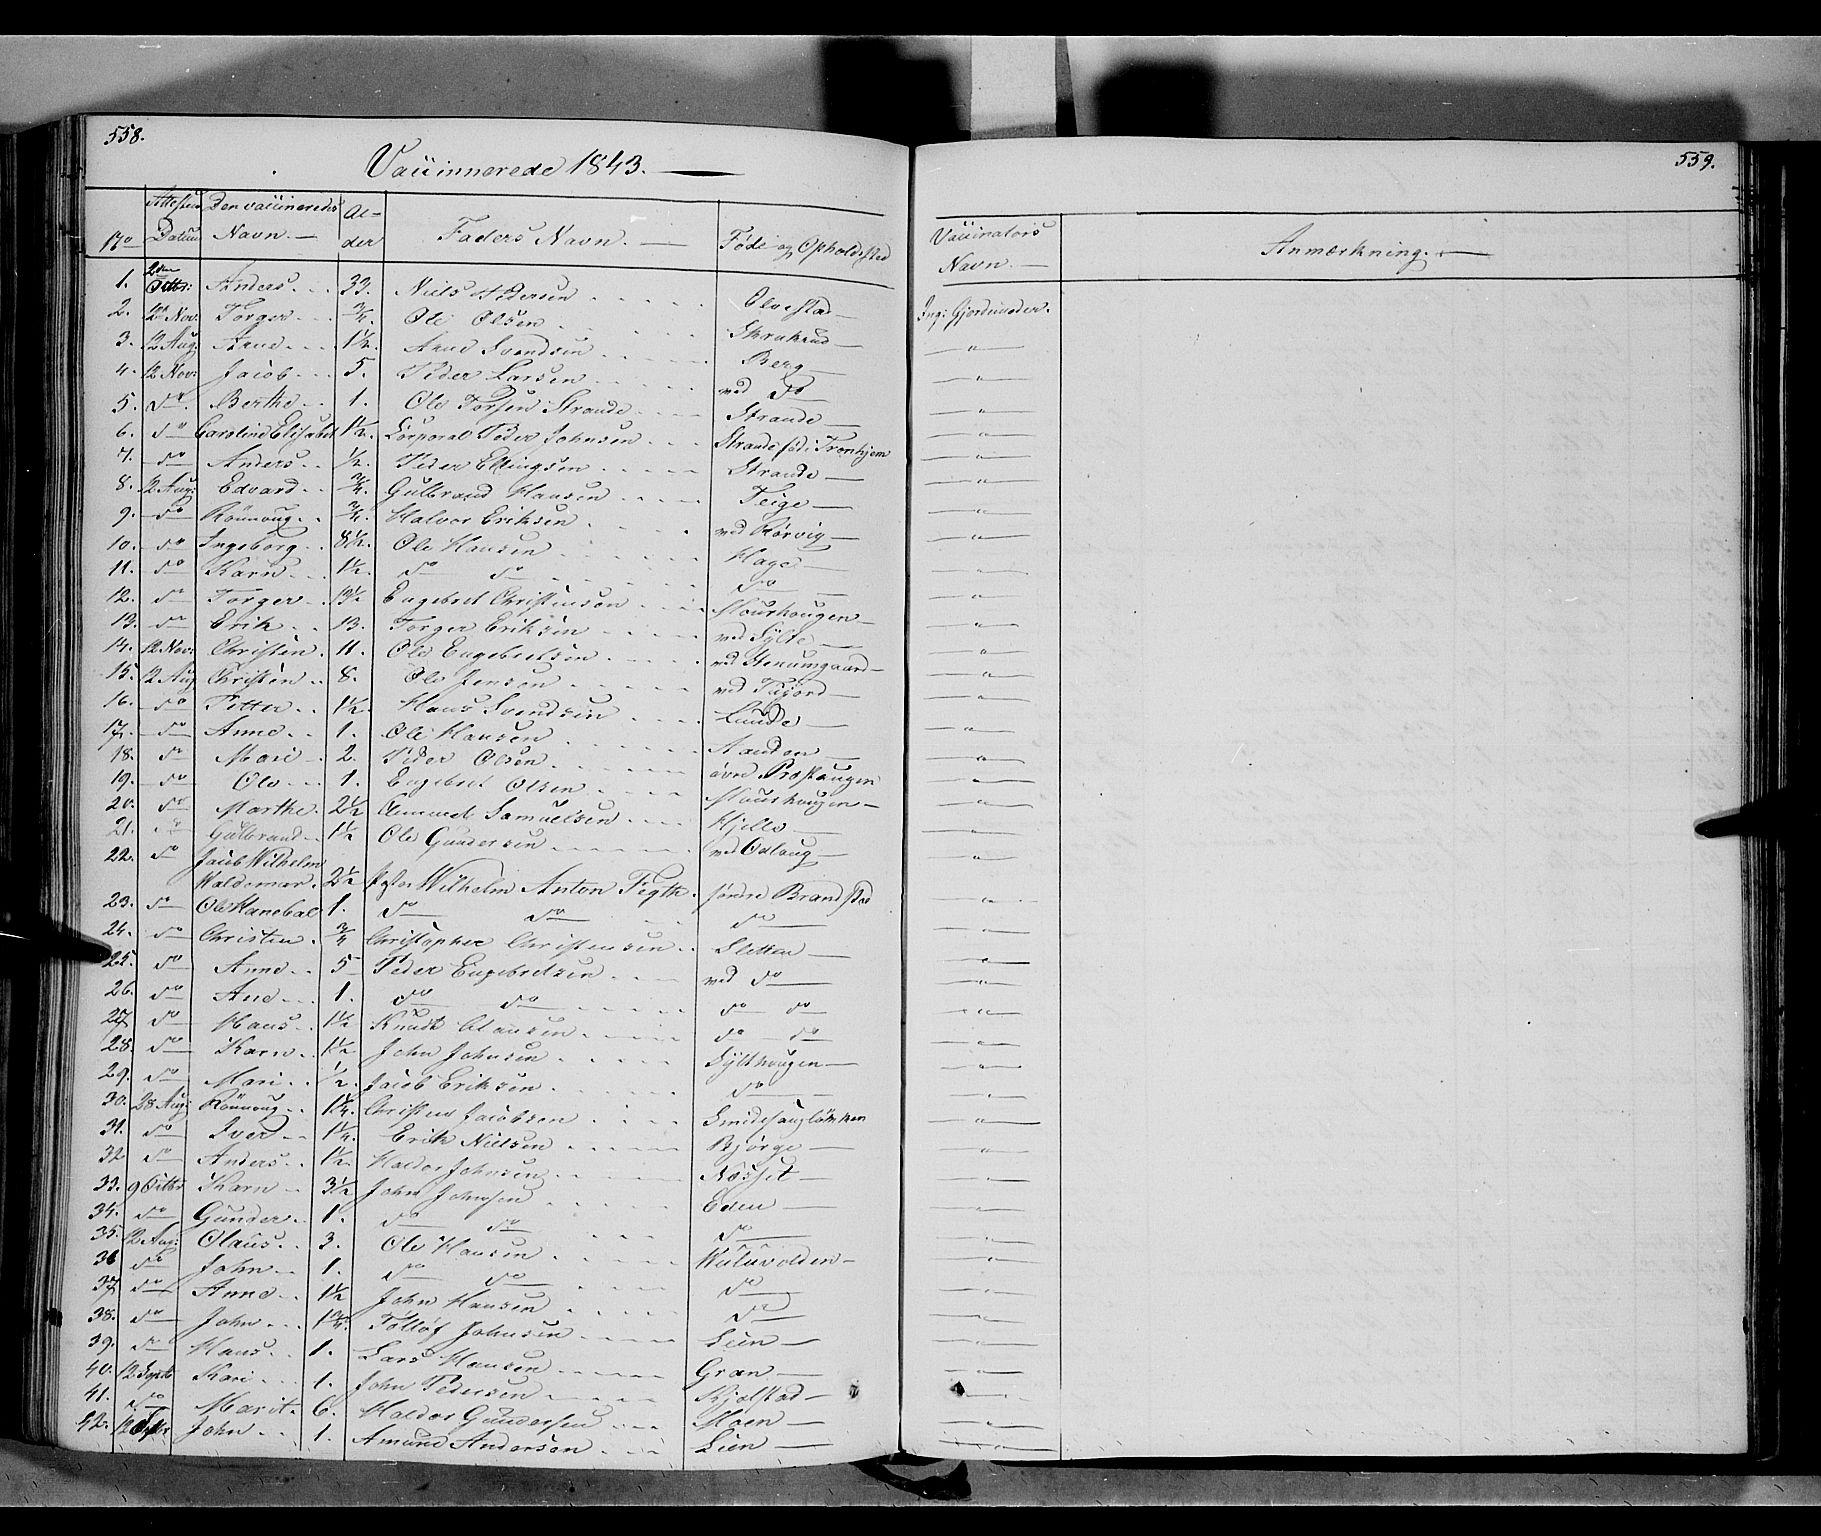 SAH, Ringebu prestekontor, Ministerialbok nr. 5, 1839-1848, s. 558-559